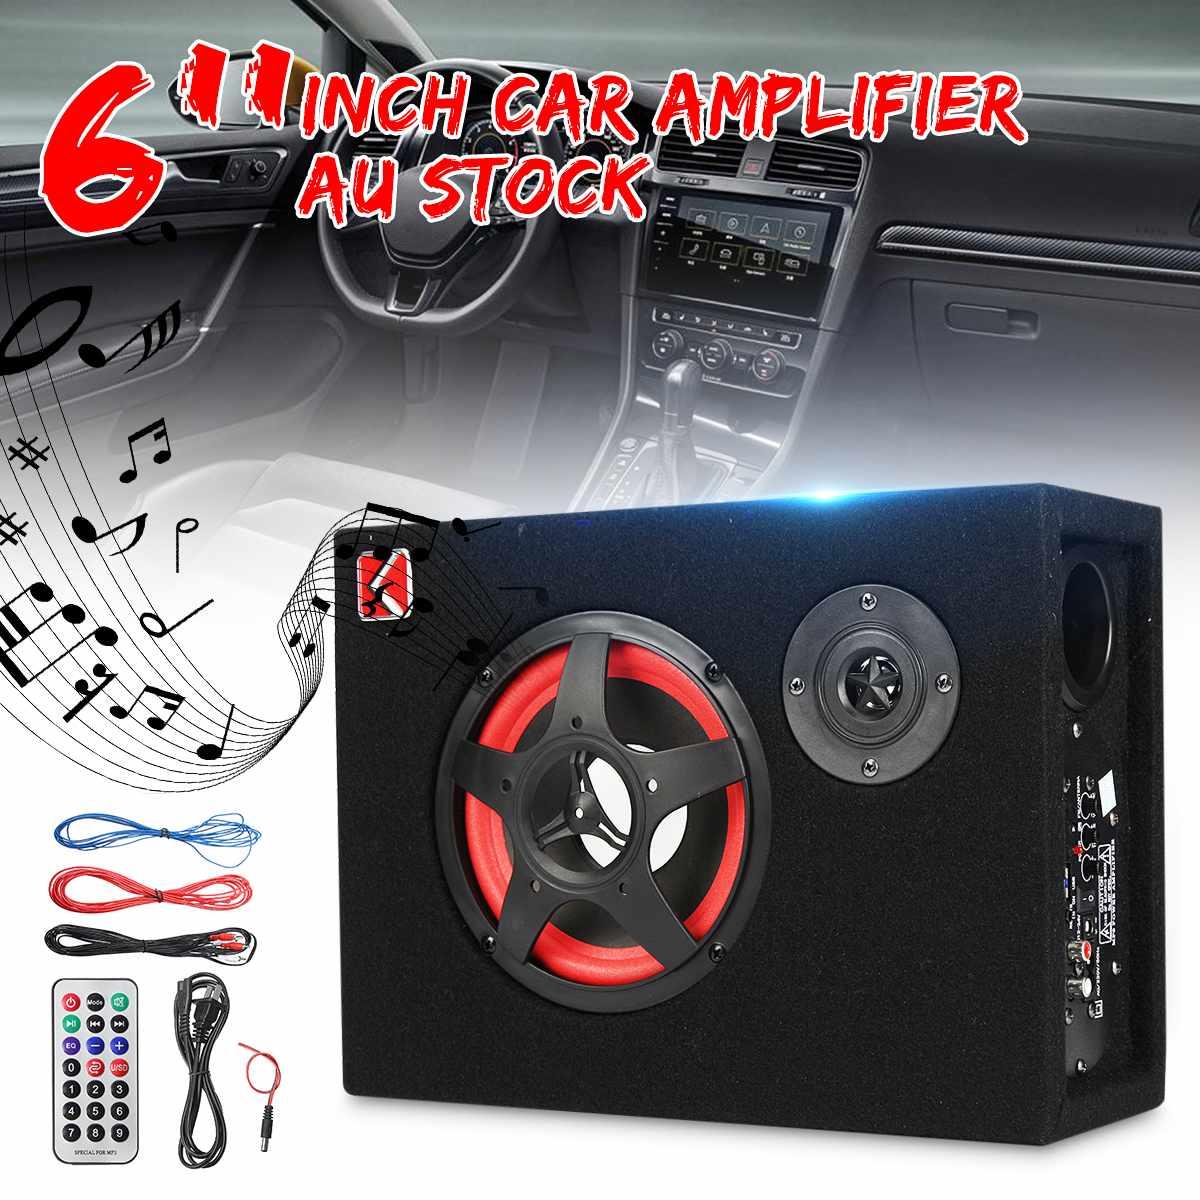 350W Lautsprecher Audio Stereo Bass Unter Sitz Aktive Auto Subwoofer Leistungsstarke 4oHm 6 zoll Karte Auto Sitz Power Auto 12V 24V 220V Lautsprecher